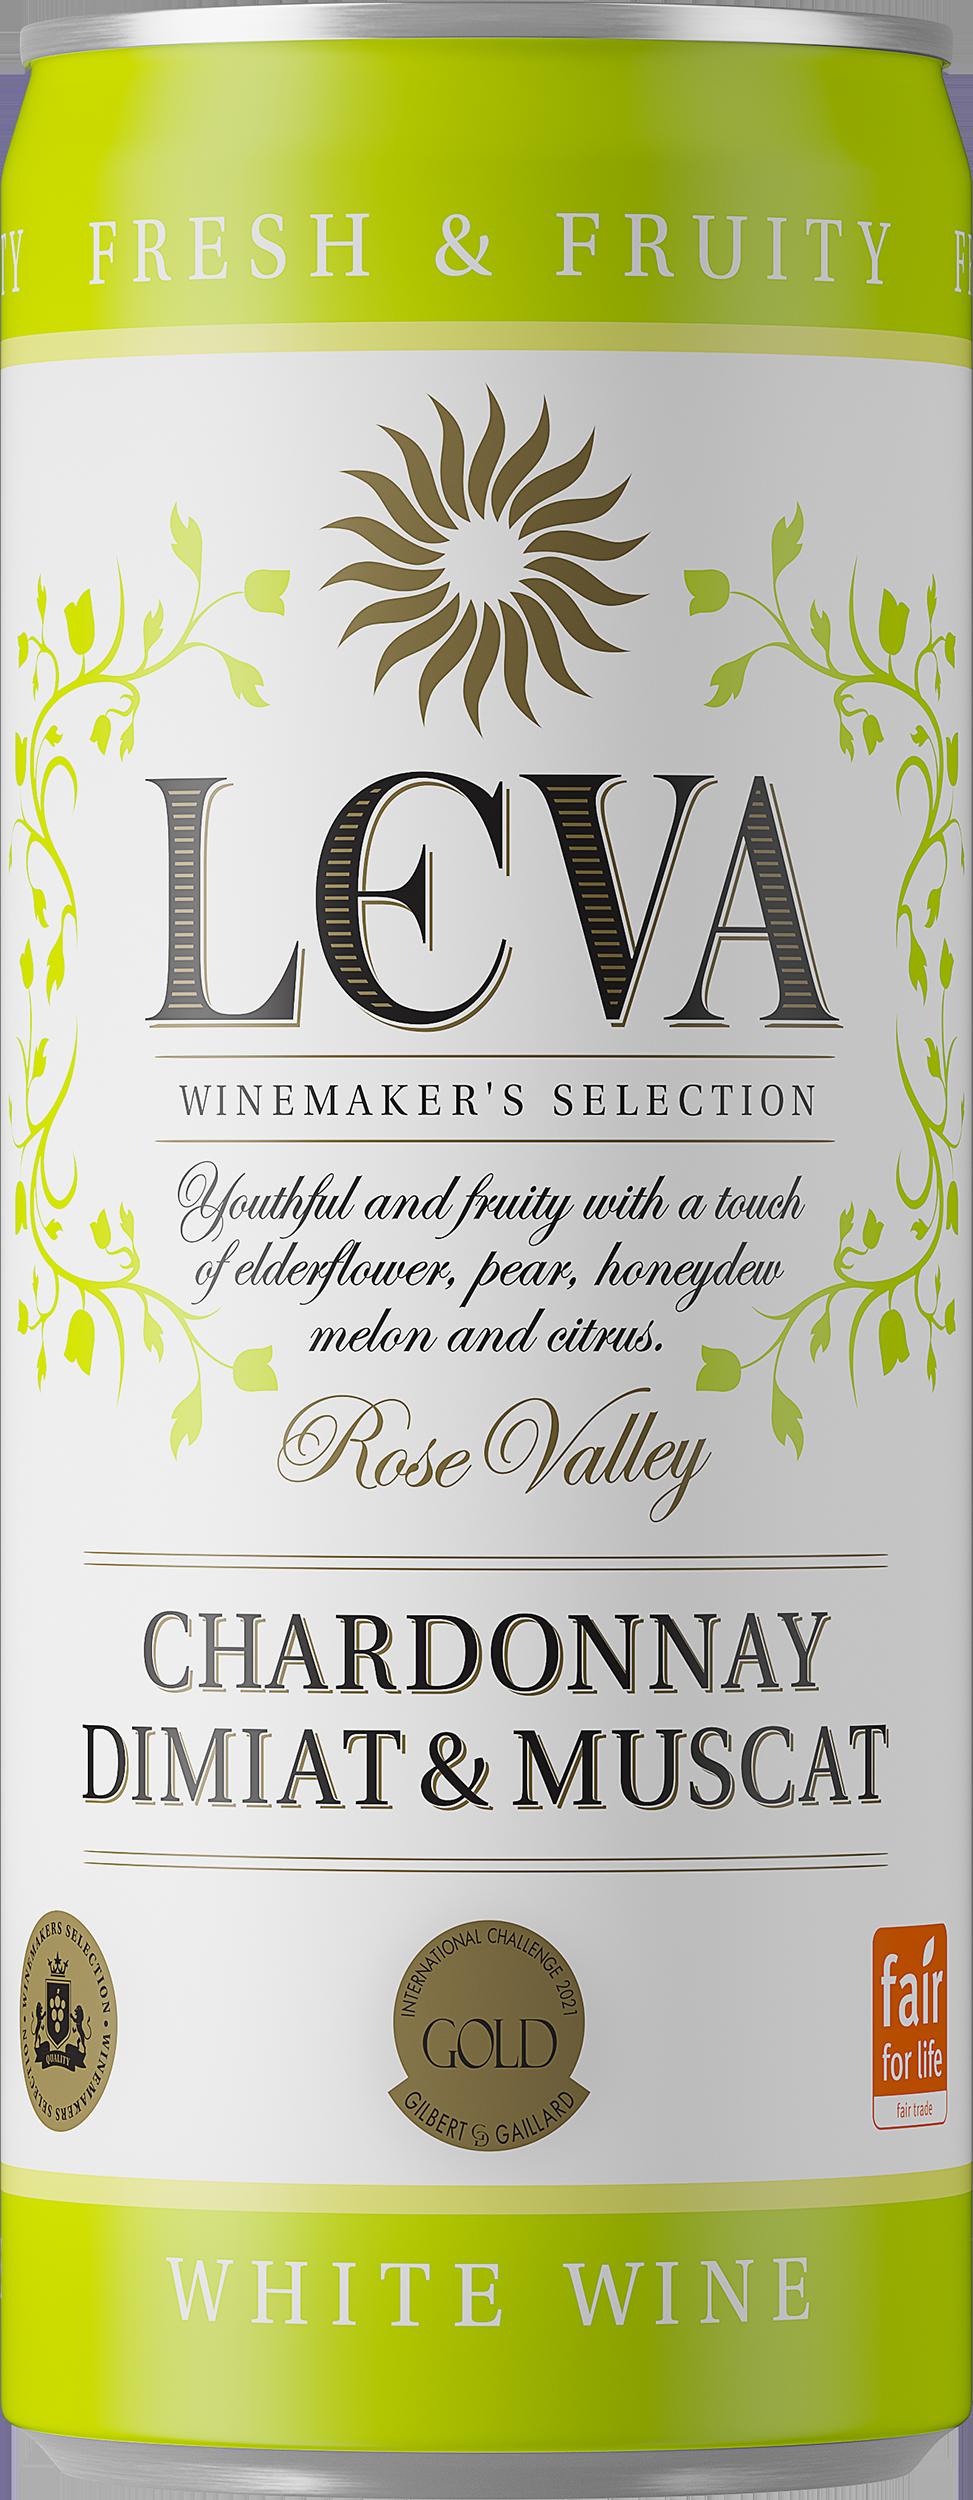 Leva Chardonnay Dimiat Muscat burk